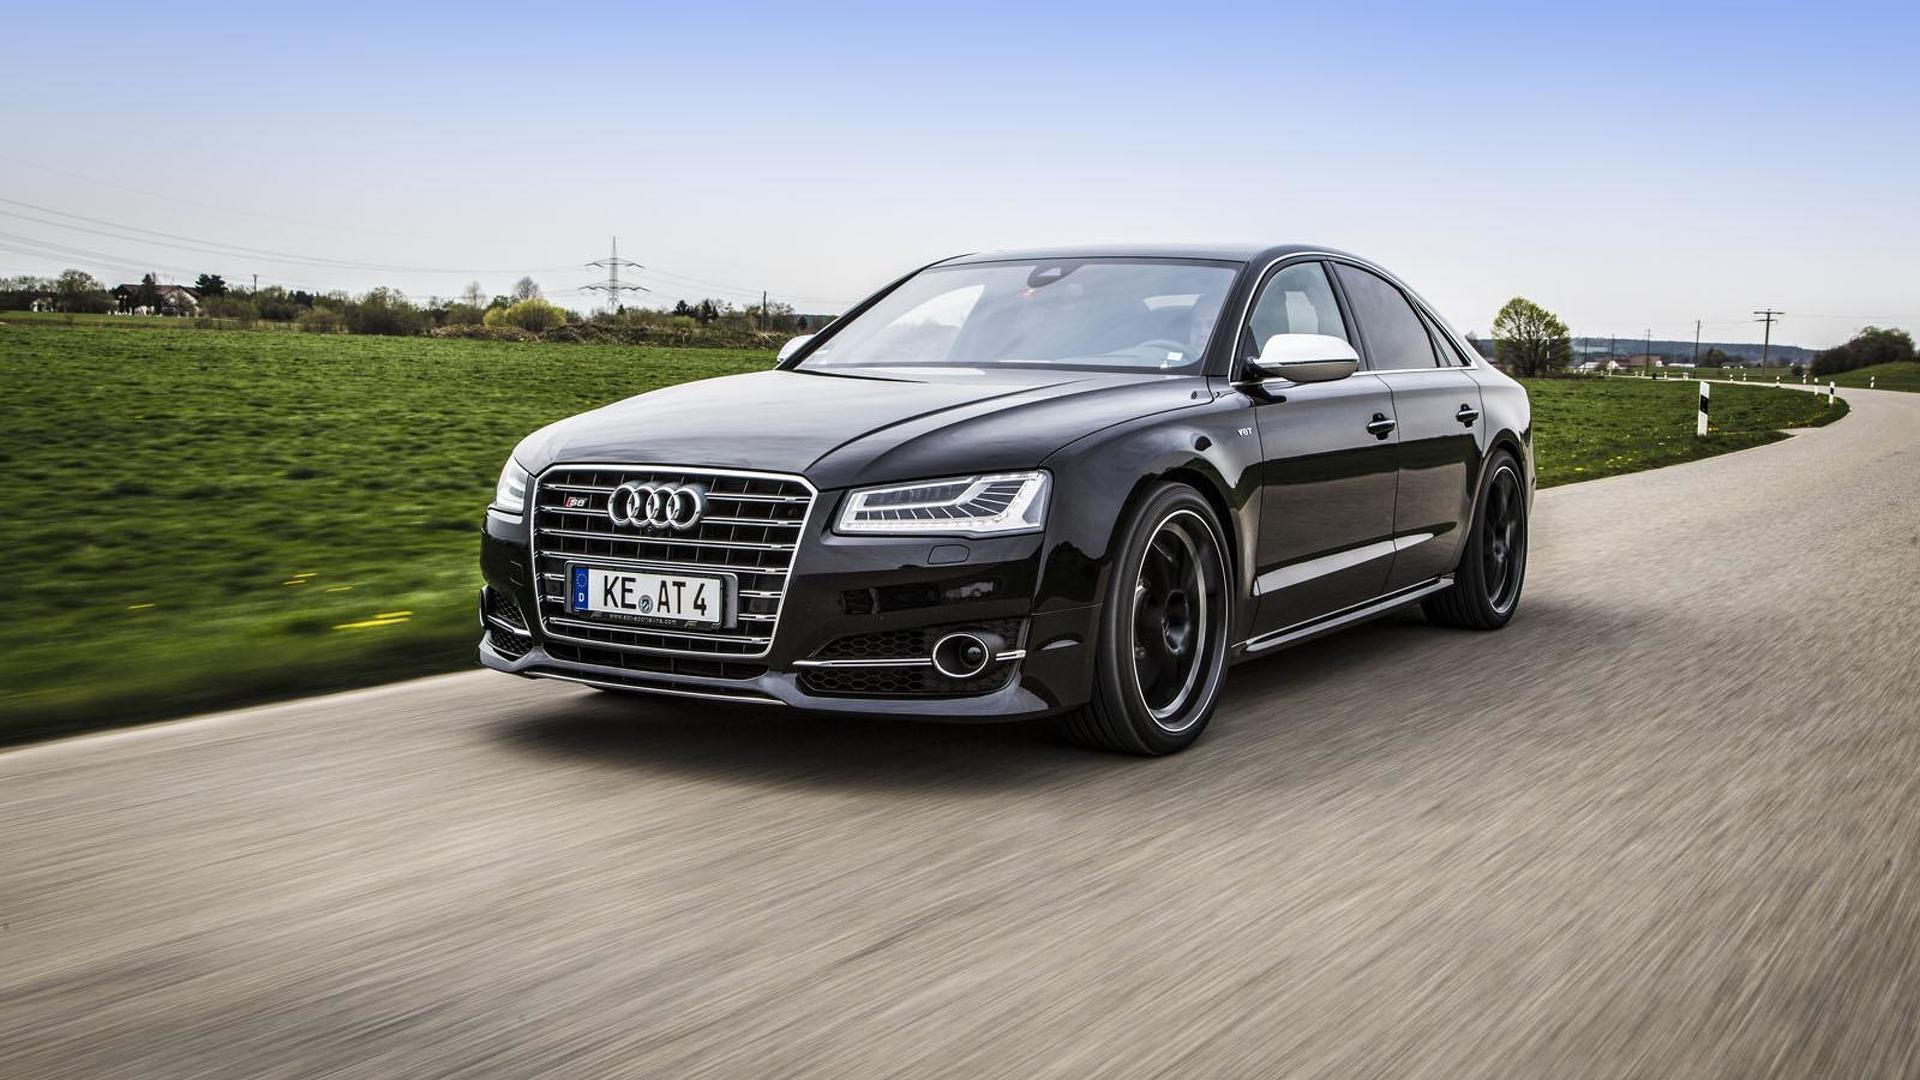 Немецкий тюнинг Audi S8 от ABT Sportsline